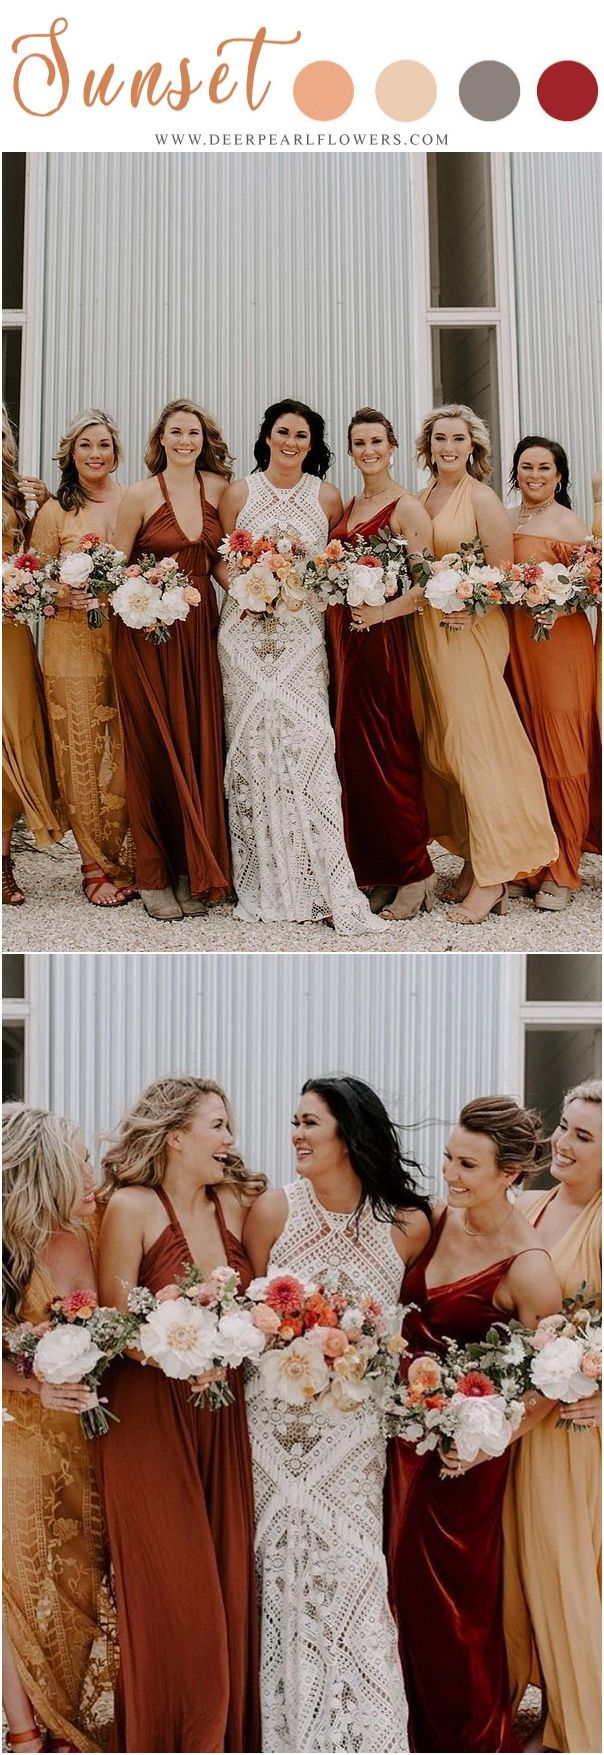 Sunset Orange Wedding Color Ideas Orange Bridesmaid Dresses Weddings Weddingi Orange Bridesmaid Dresses Fall Bridesmaid Dresses Burgundy Bridesmaid Dresses [ 1755 x 604 Pixel ]